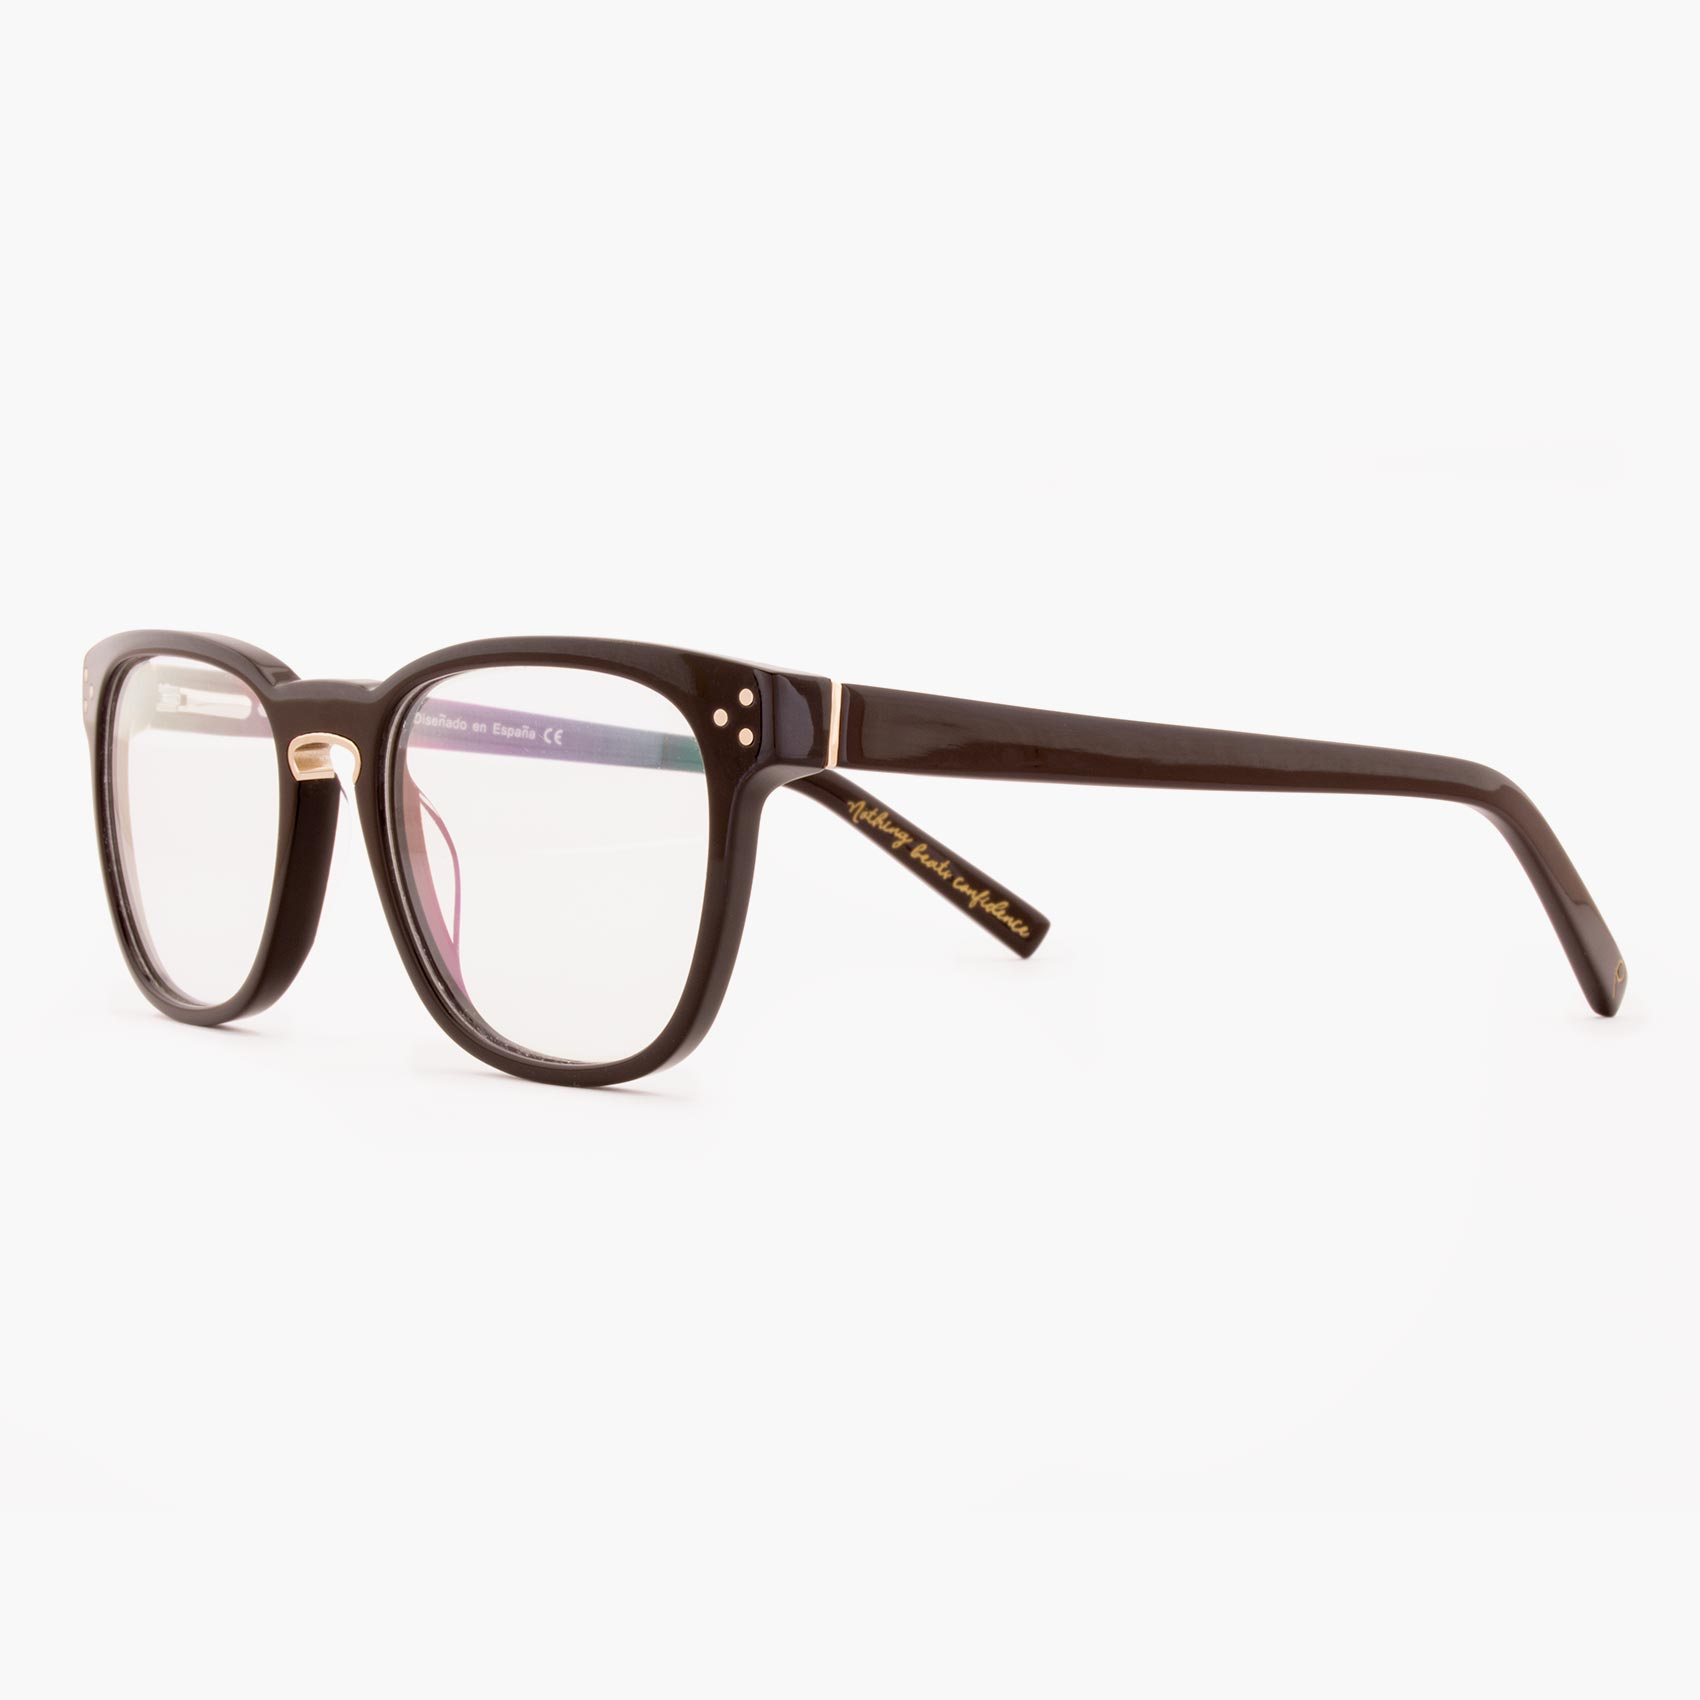 Proud eyewear Firth C2 L montura gafas acetato marron oscuro